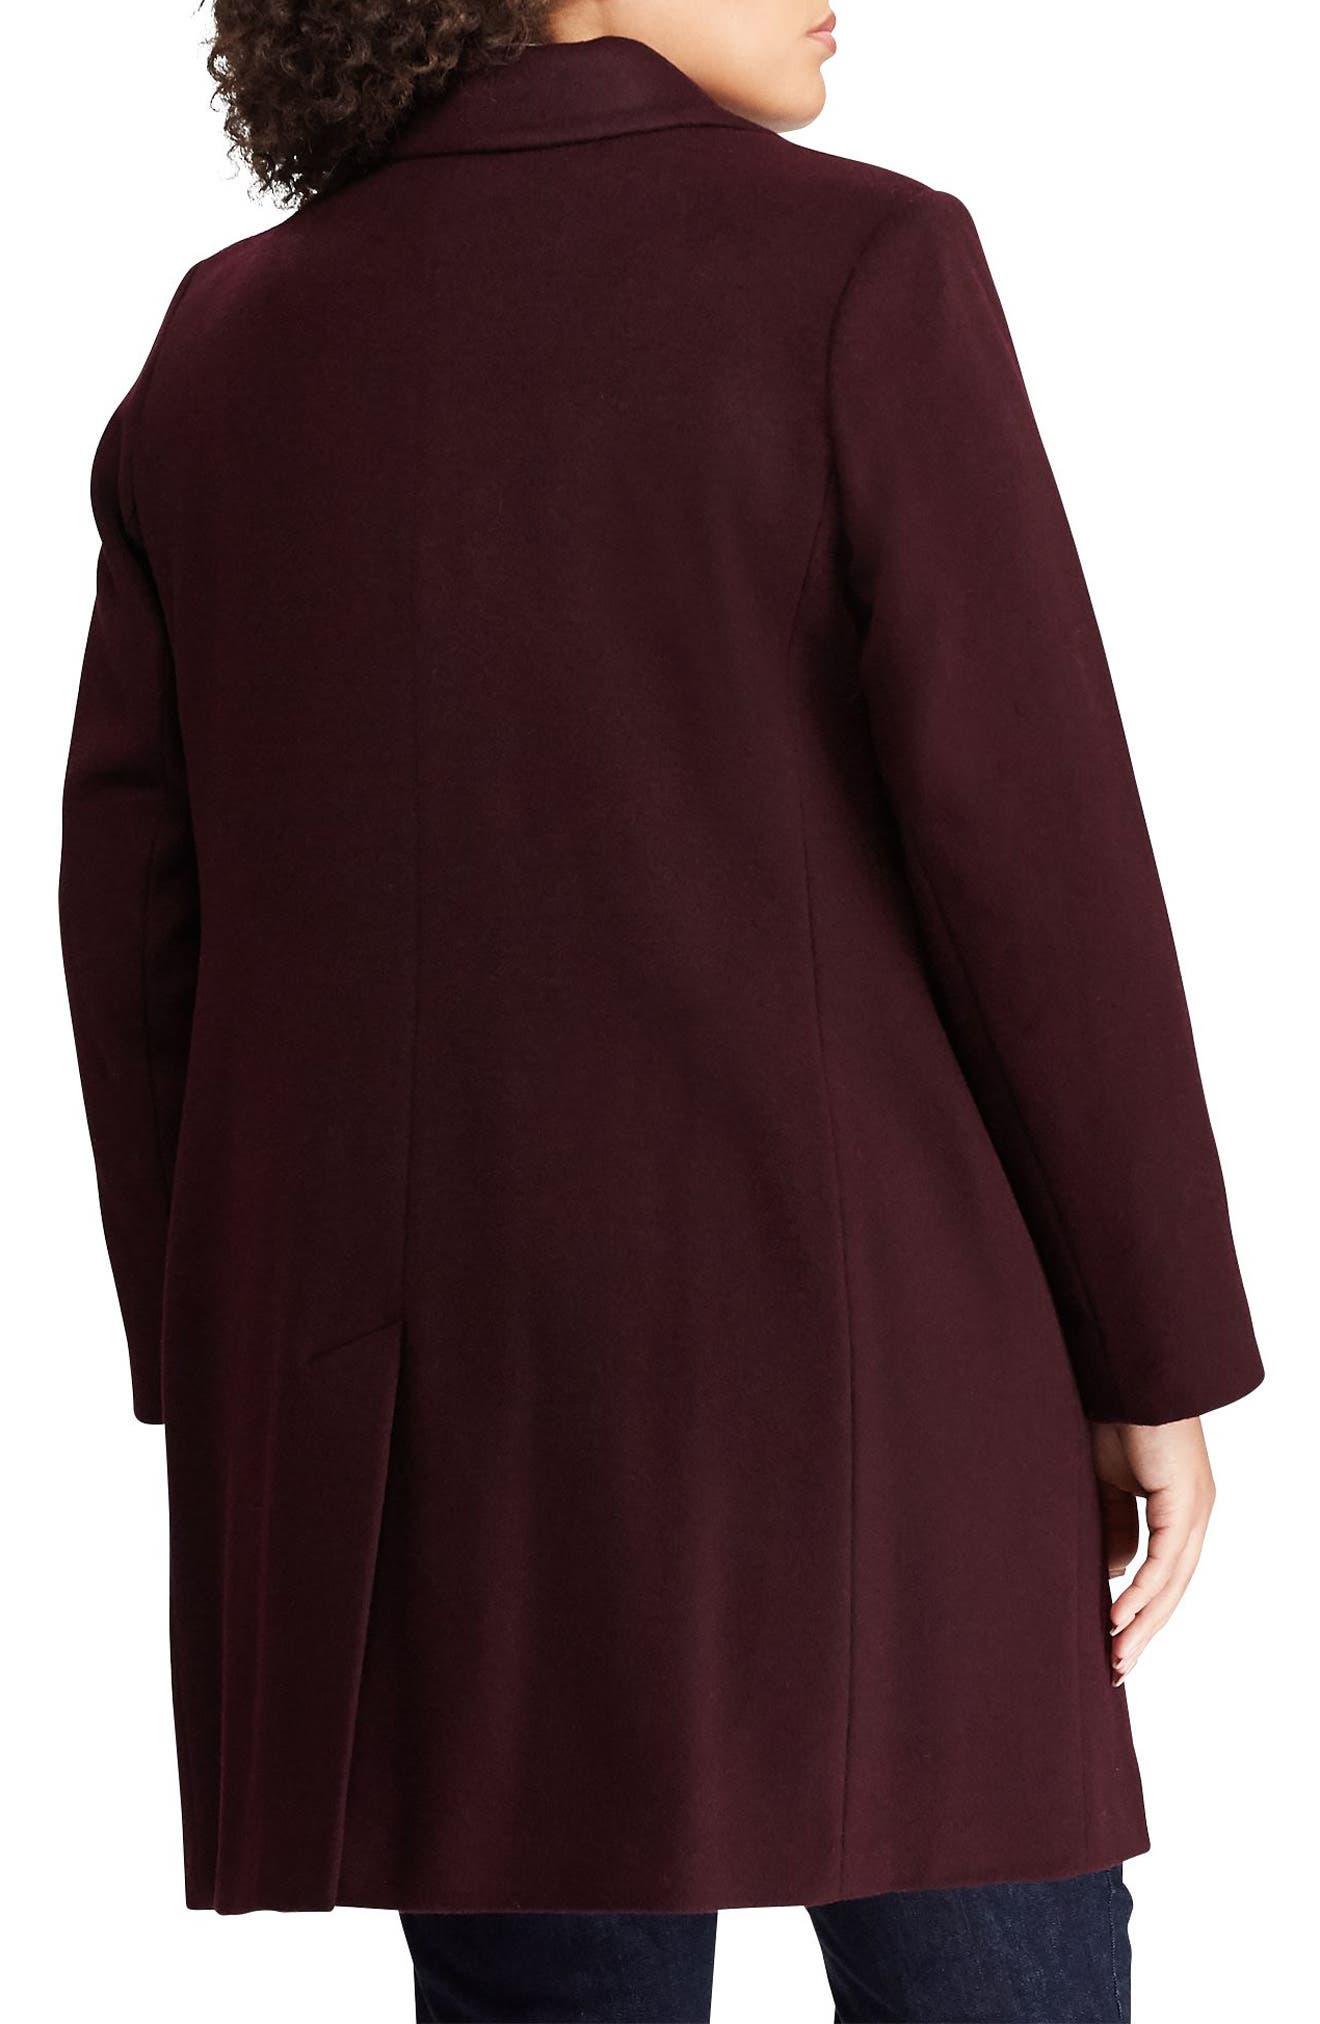 LAUREN RALPH LAUREN,                             Wool Blend Reefer Coat,                             Alternate thumbnail 2, color,                             BURGUNDY